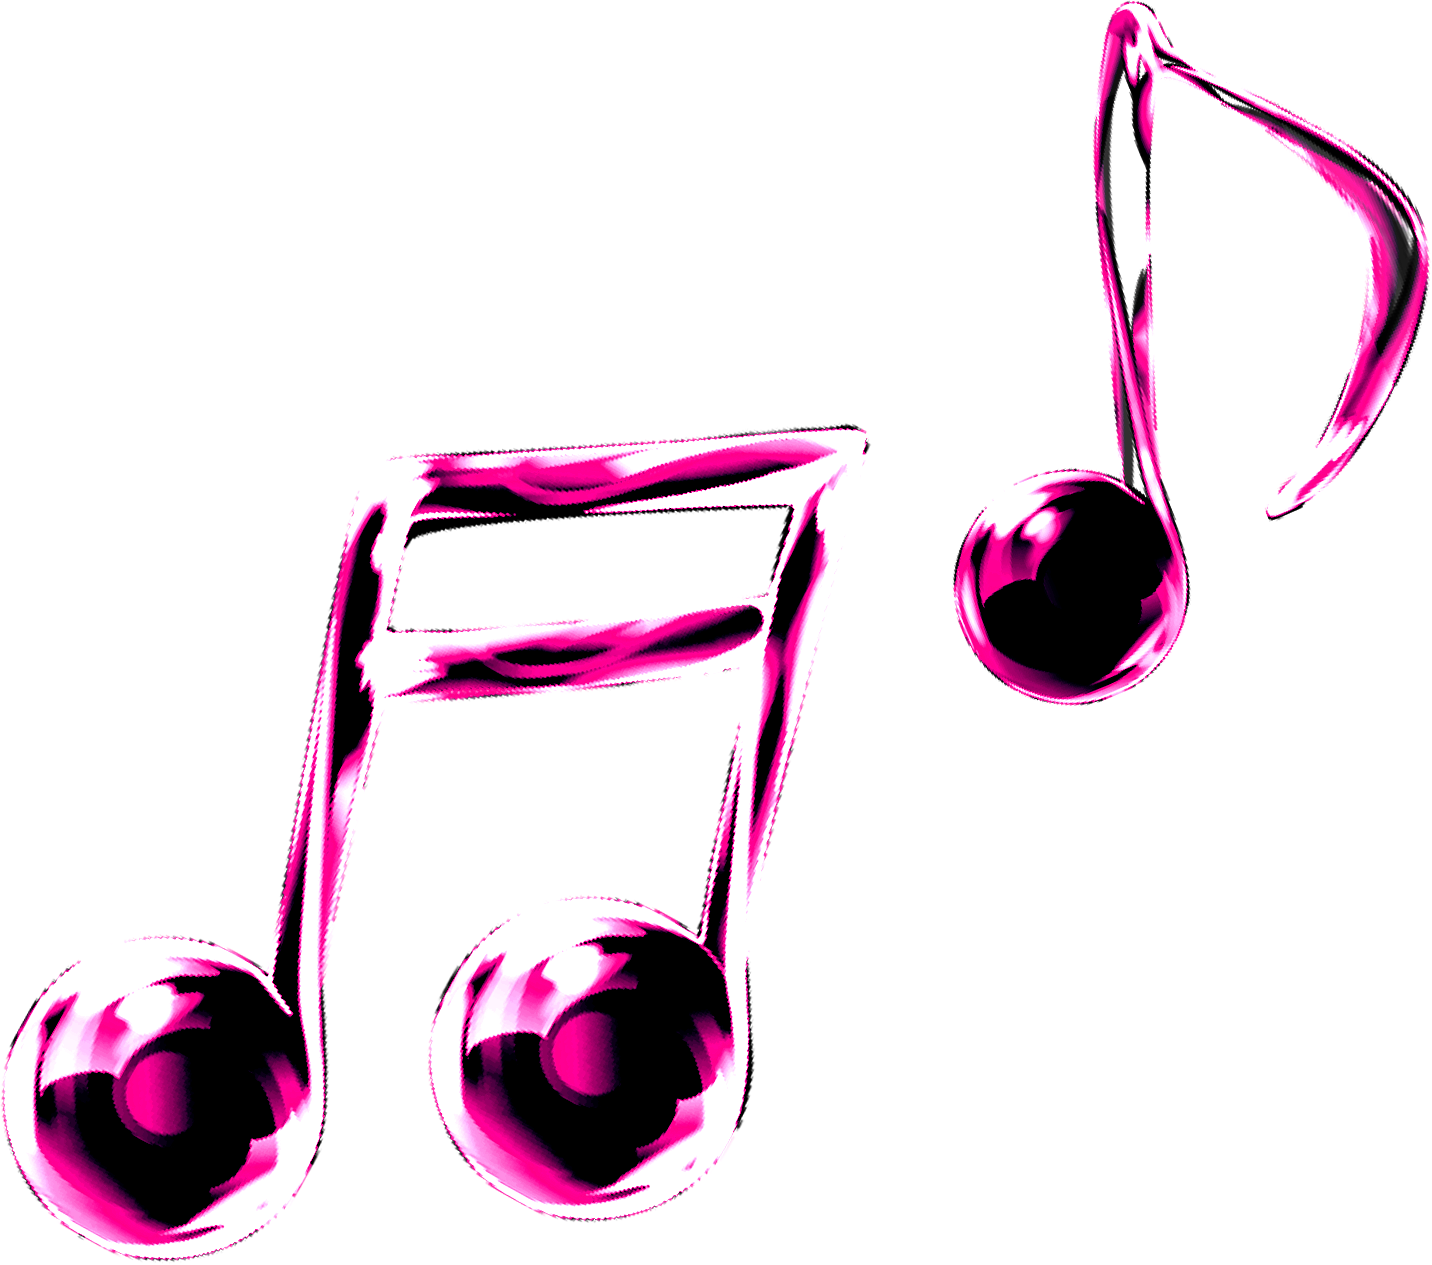 Music Notes Png Music Notes Music Notes Art Musical Notes Art